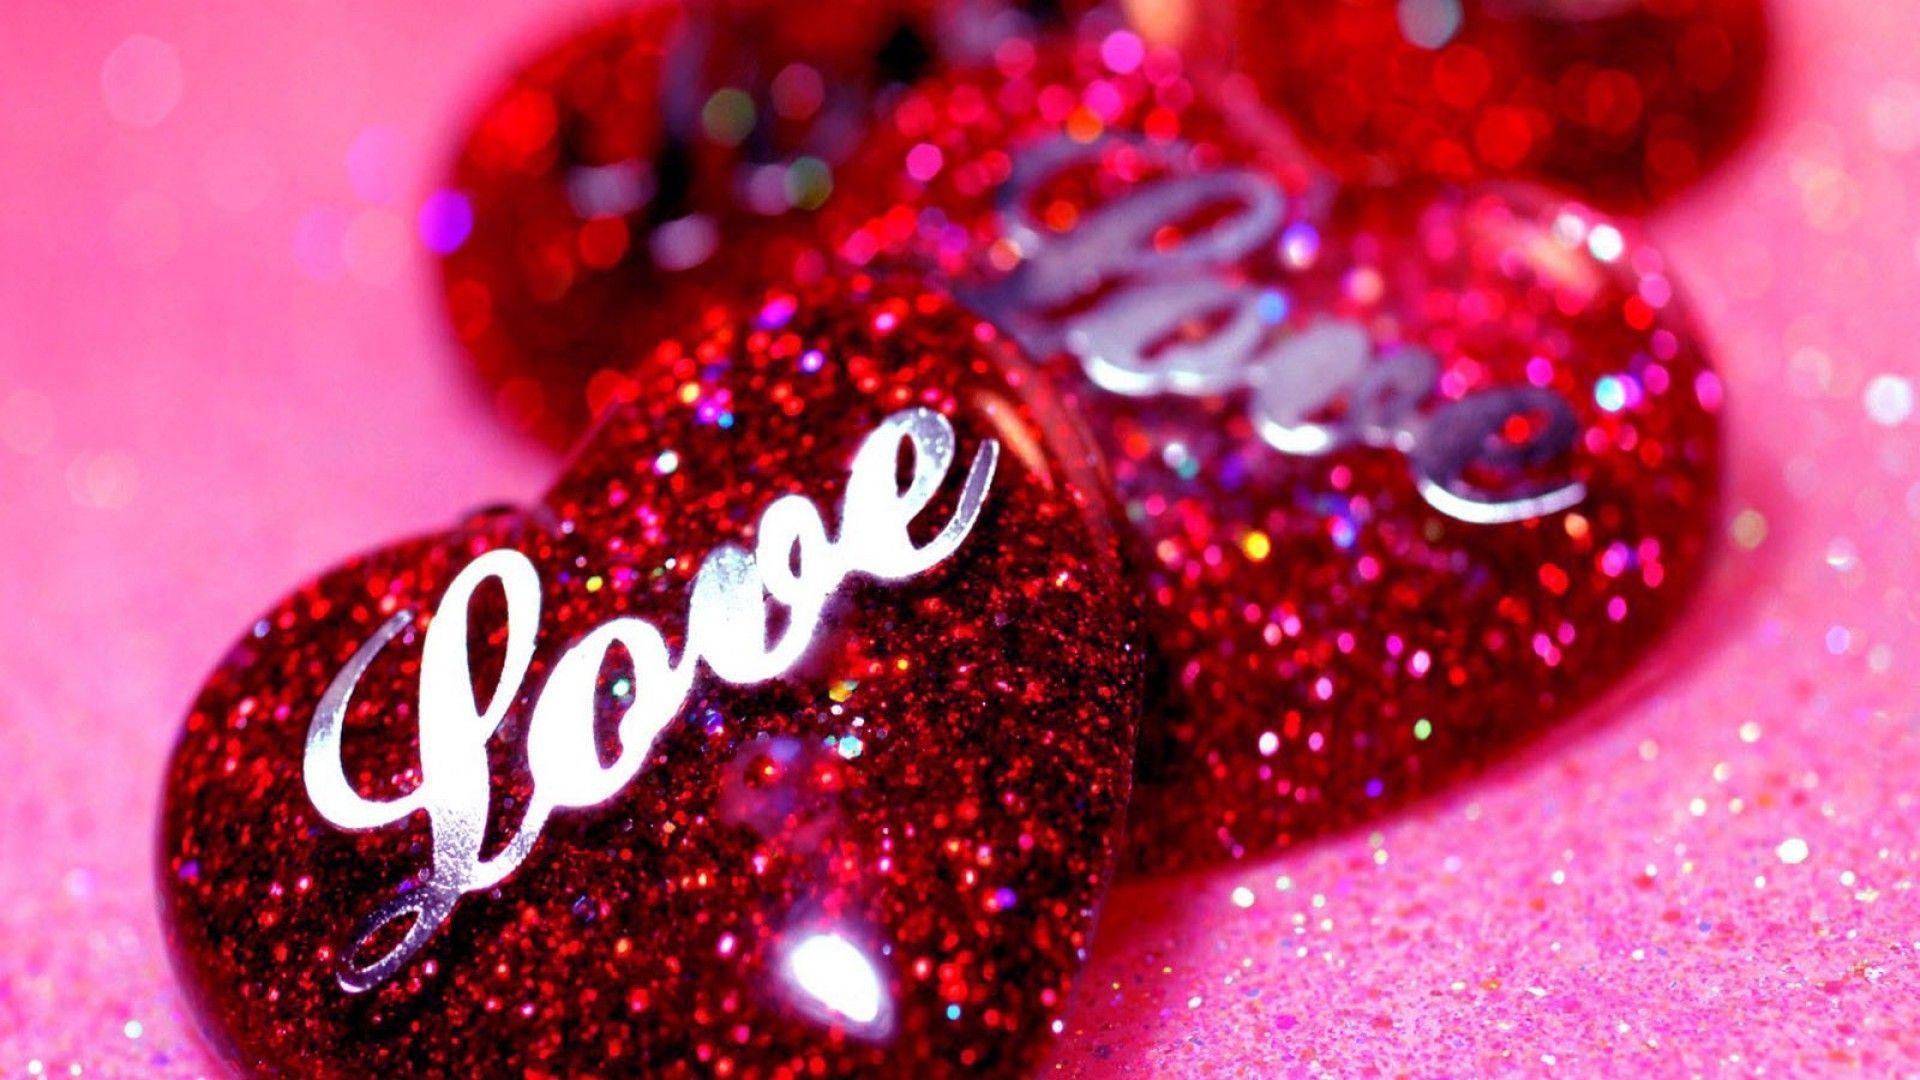 Love flowers wallpapers wallpaper cave love heart symbol tumblr hd wallpaper and download free wallpaper biocorpaavc